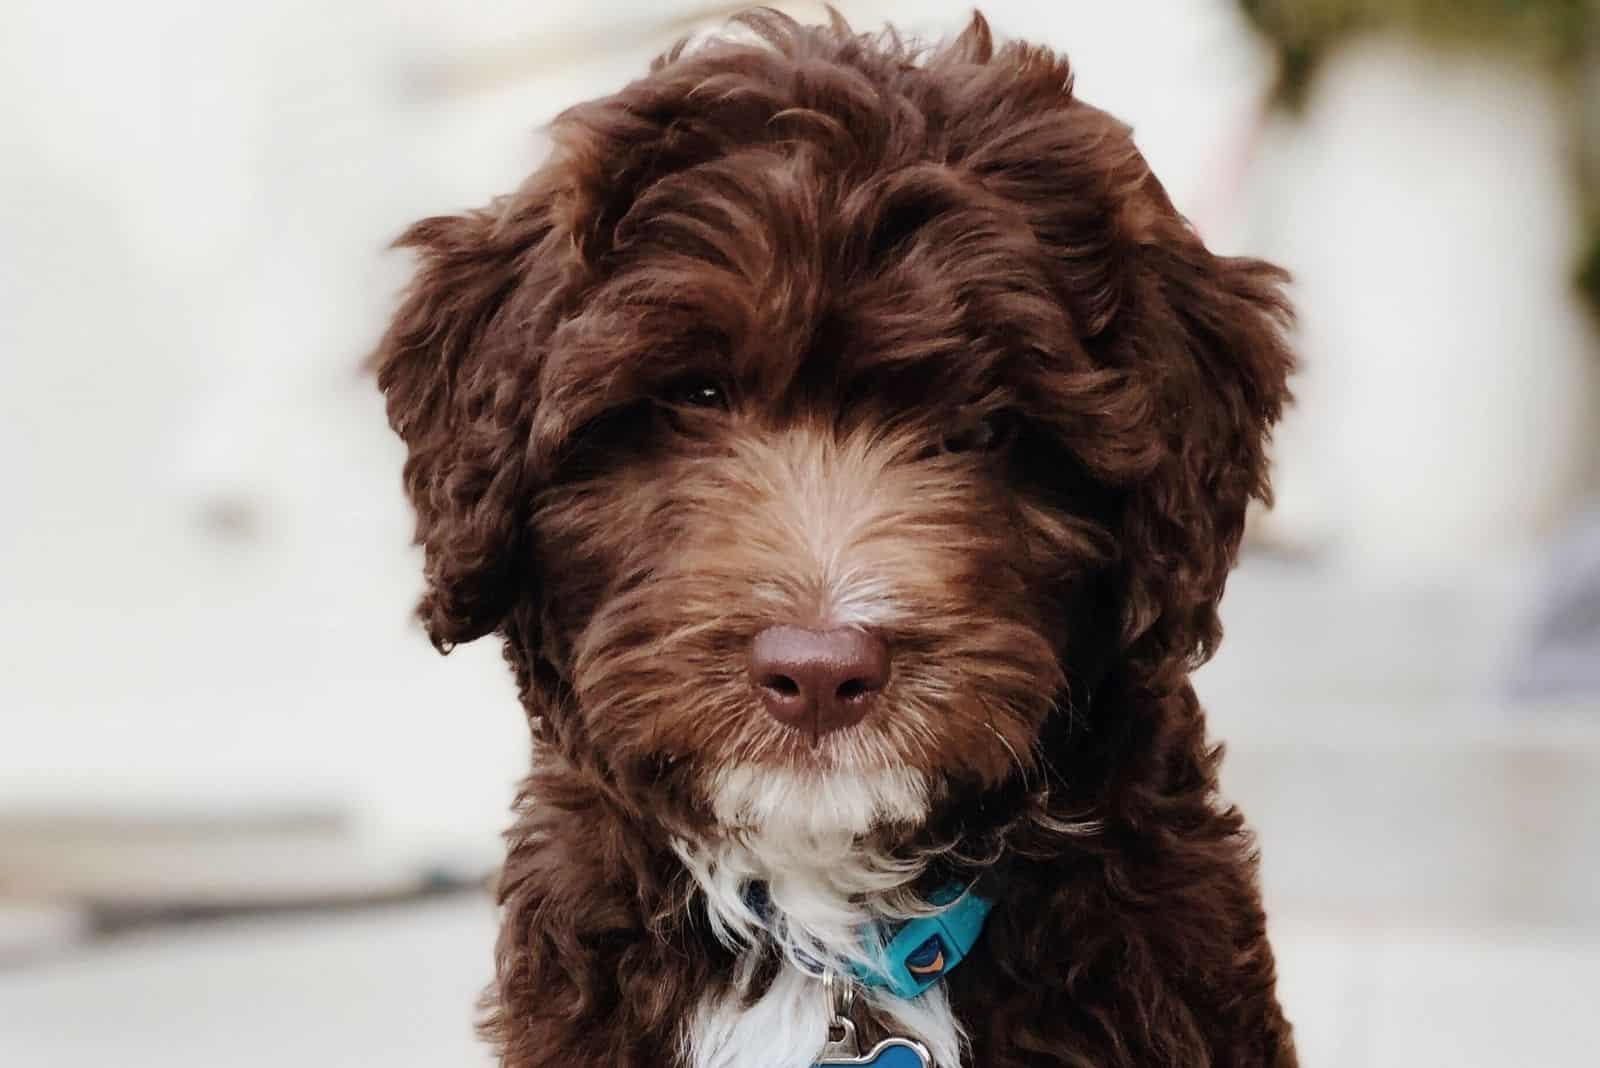 portrait of a chocolate bernedoodle dog